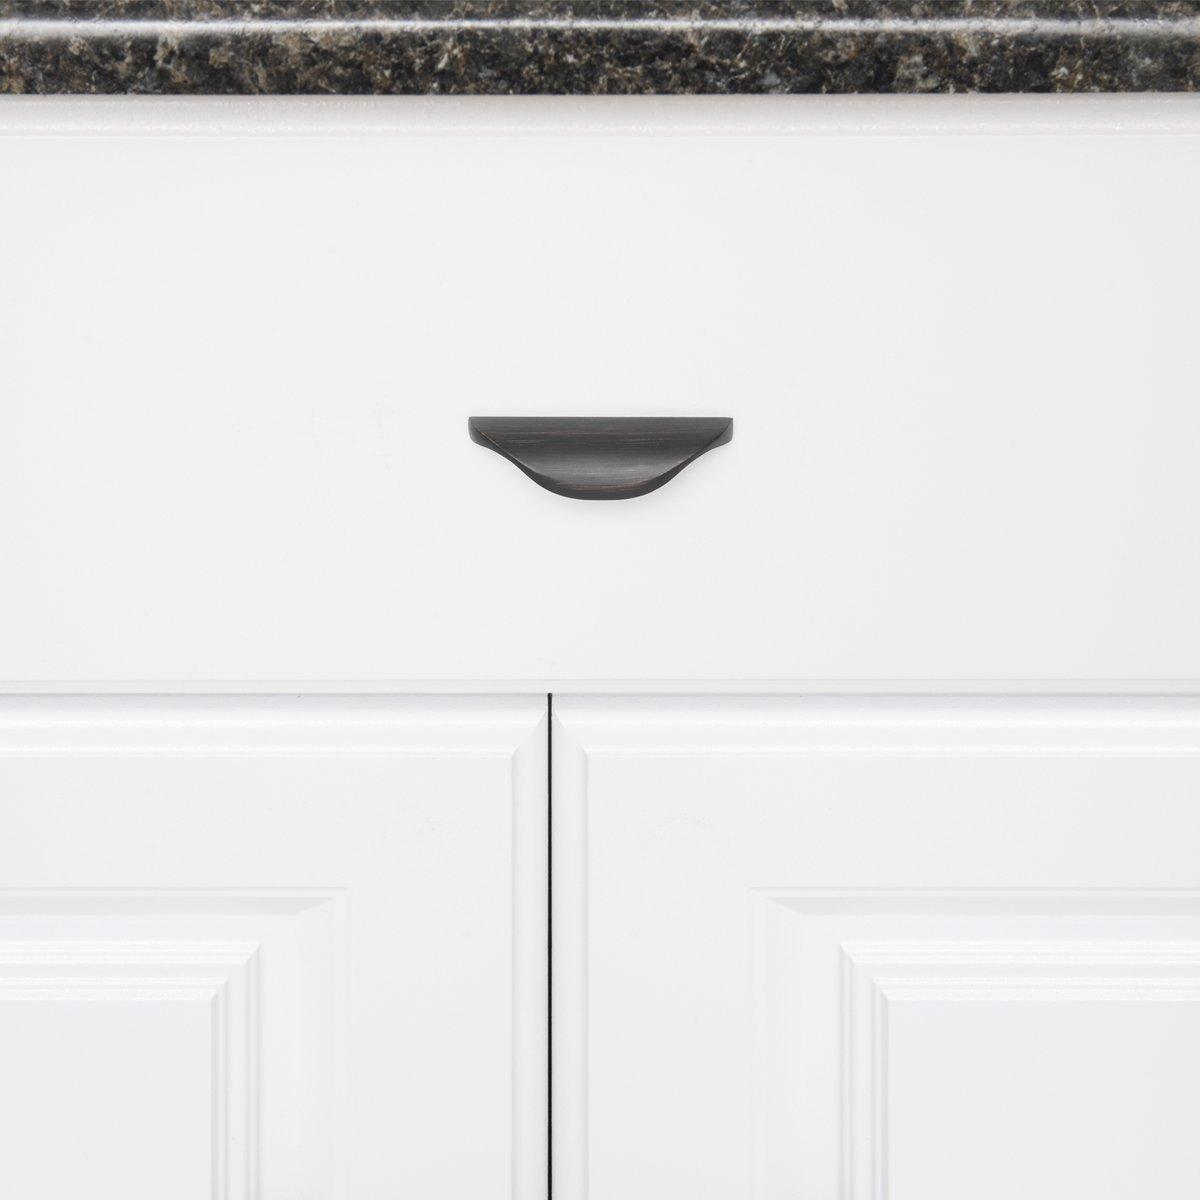 para armario plata envejecida Basics orificio central de 3,2 cm 7,79 cm de longitud paquete de 10 Tirador moderno ondulado